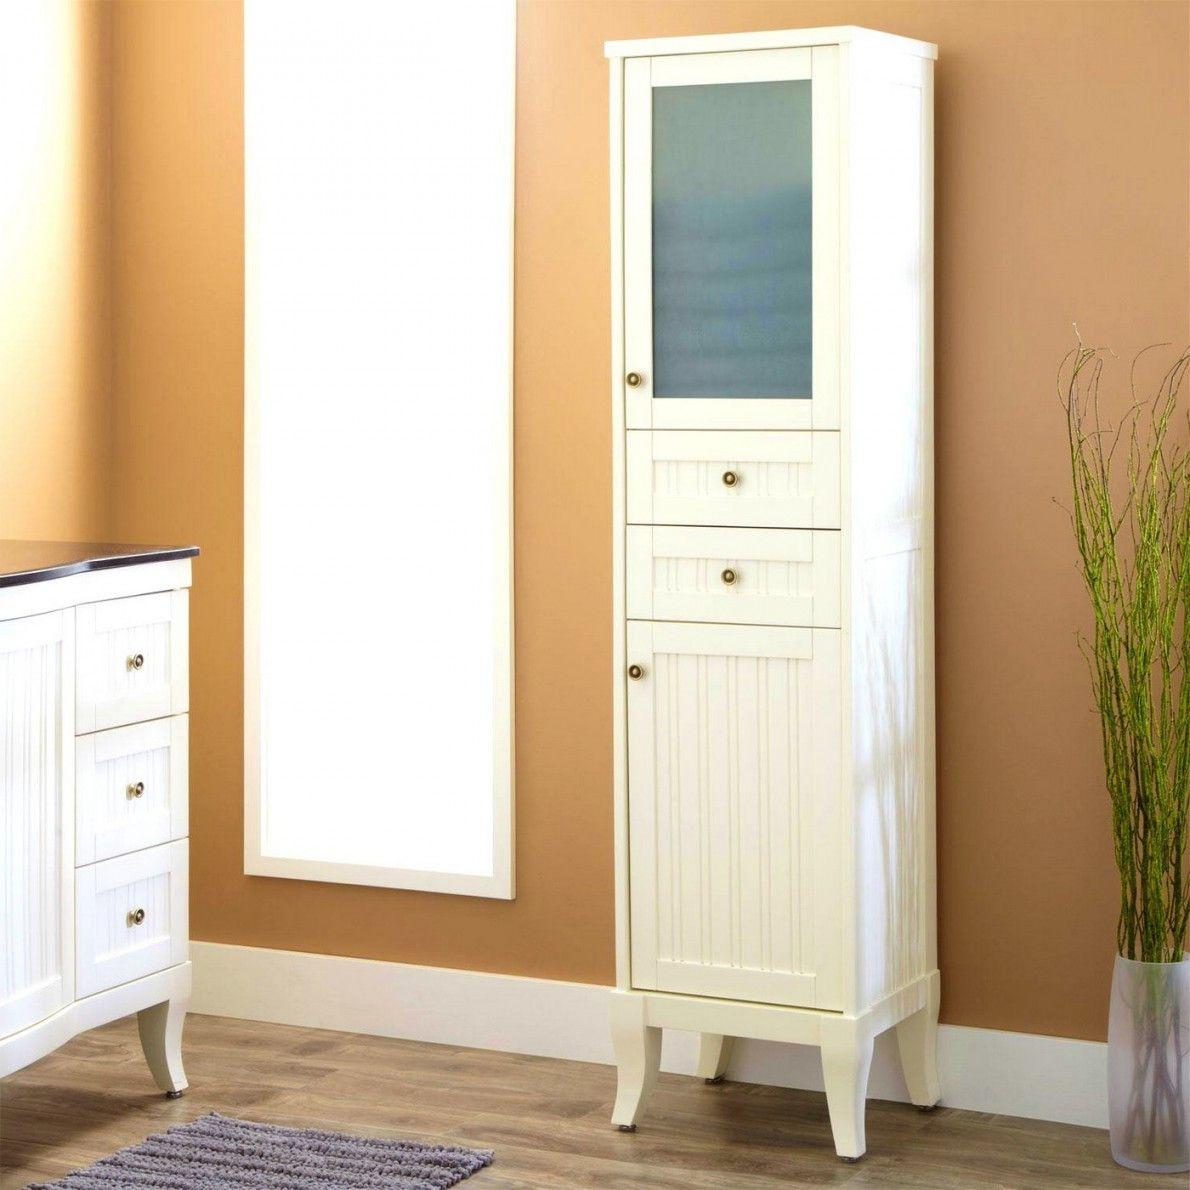 2018 White Corner Bathroom Floor Cabinet - Interior House Paint ...